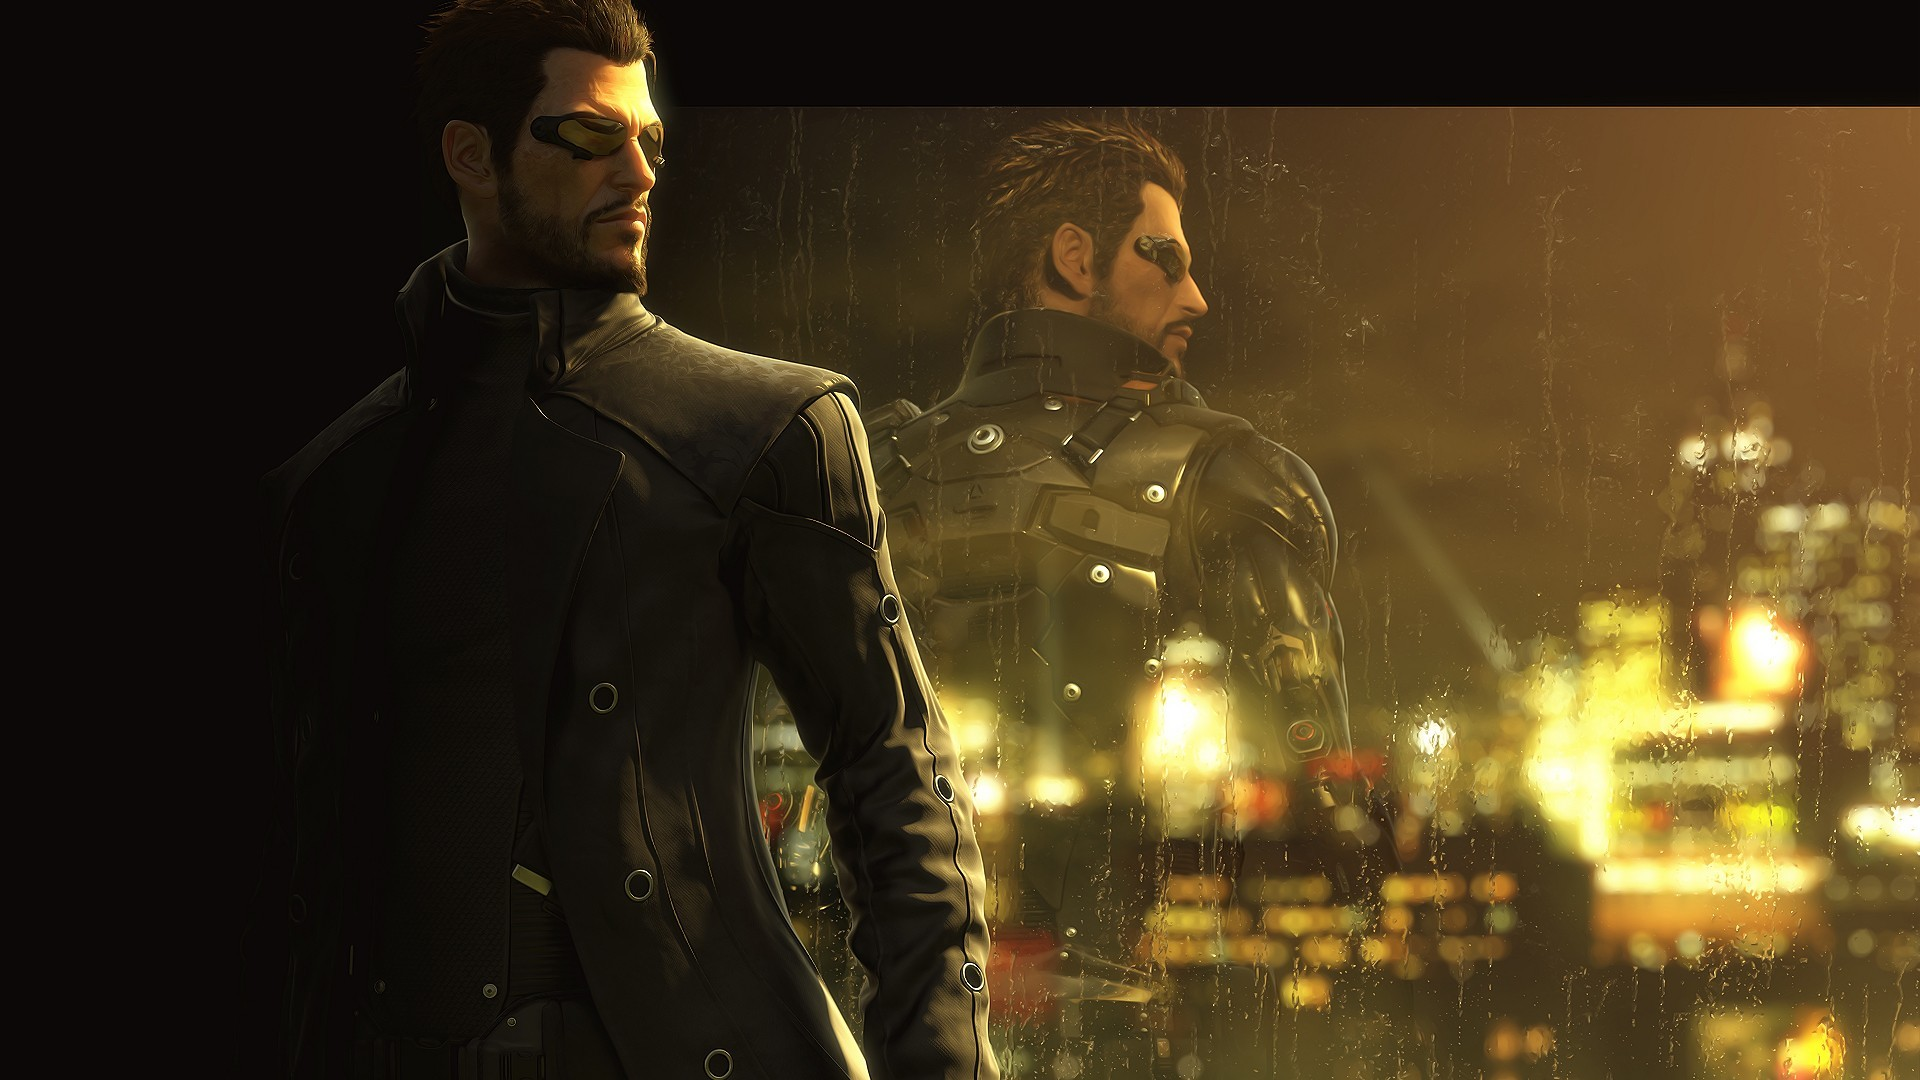 Deus Ex Mankind Divided Wallpaper: Deus Ex Mankind Divided 2016, HD Games, 4k Wallpapers